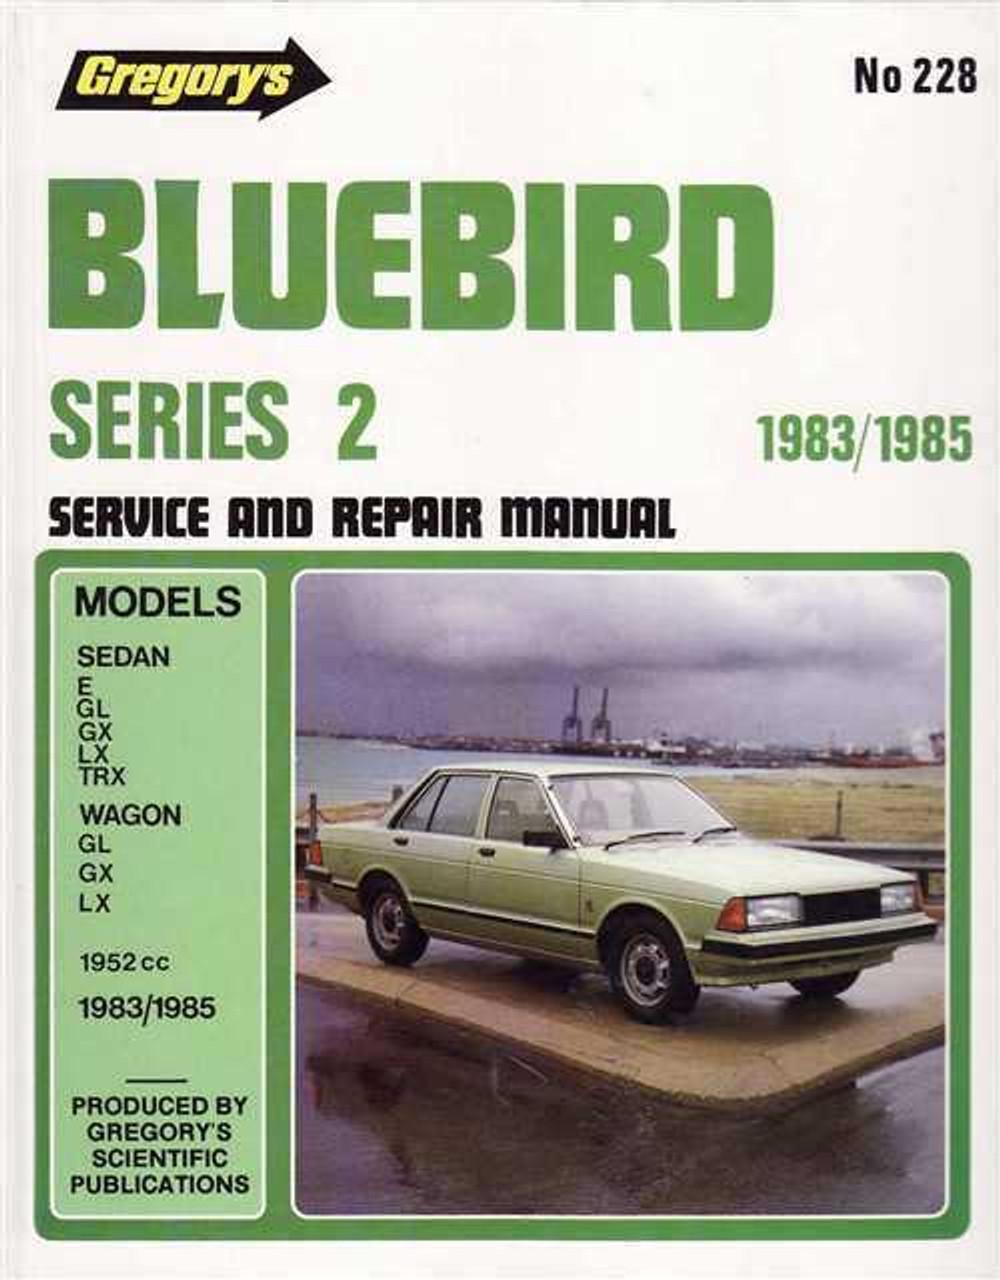 nissan bluebird series 2 1983 1985 workshop manual rh automotobookshop com au 1992 Nissan Bluebird Nissan Bluebird 1994